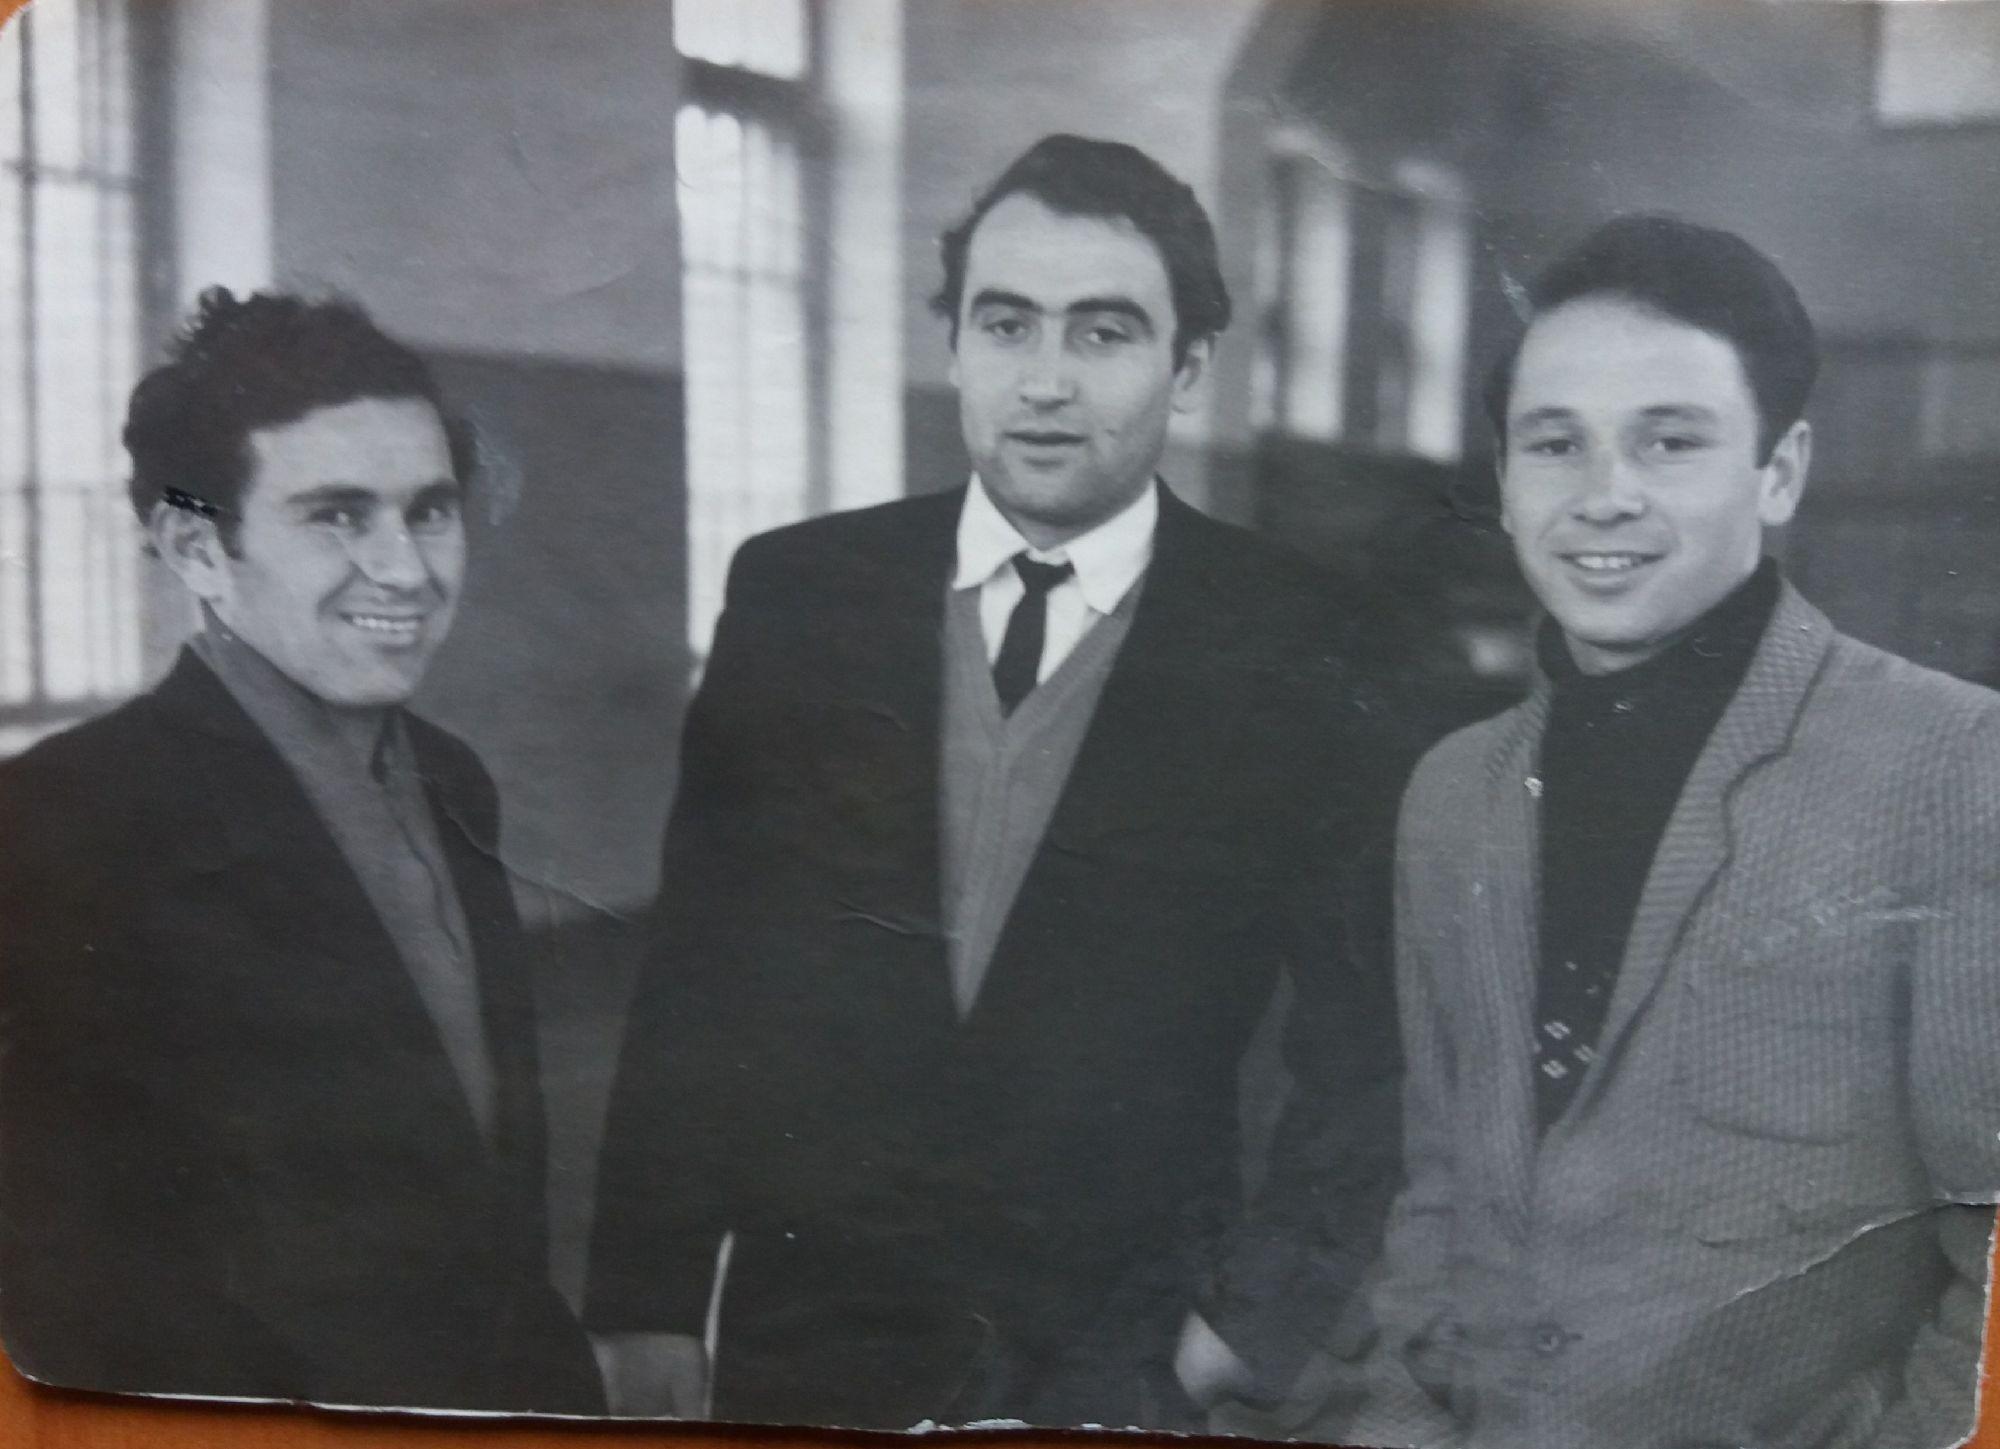 Слева направо: Джиоев Ф.В., Габараев И.В., мой отец Абаев А.С.